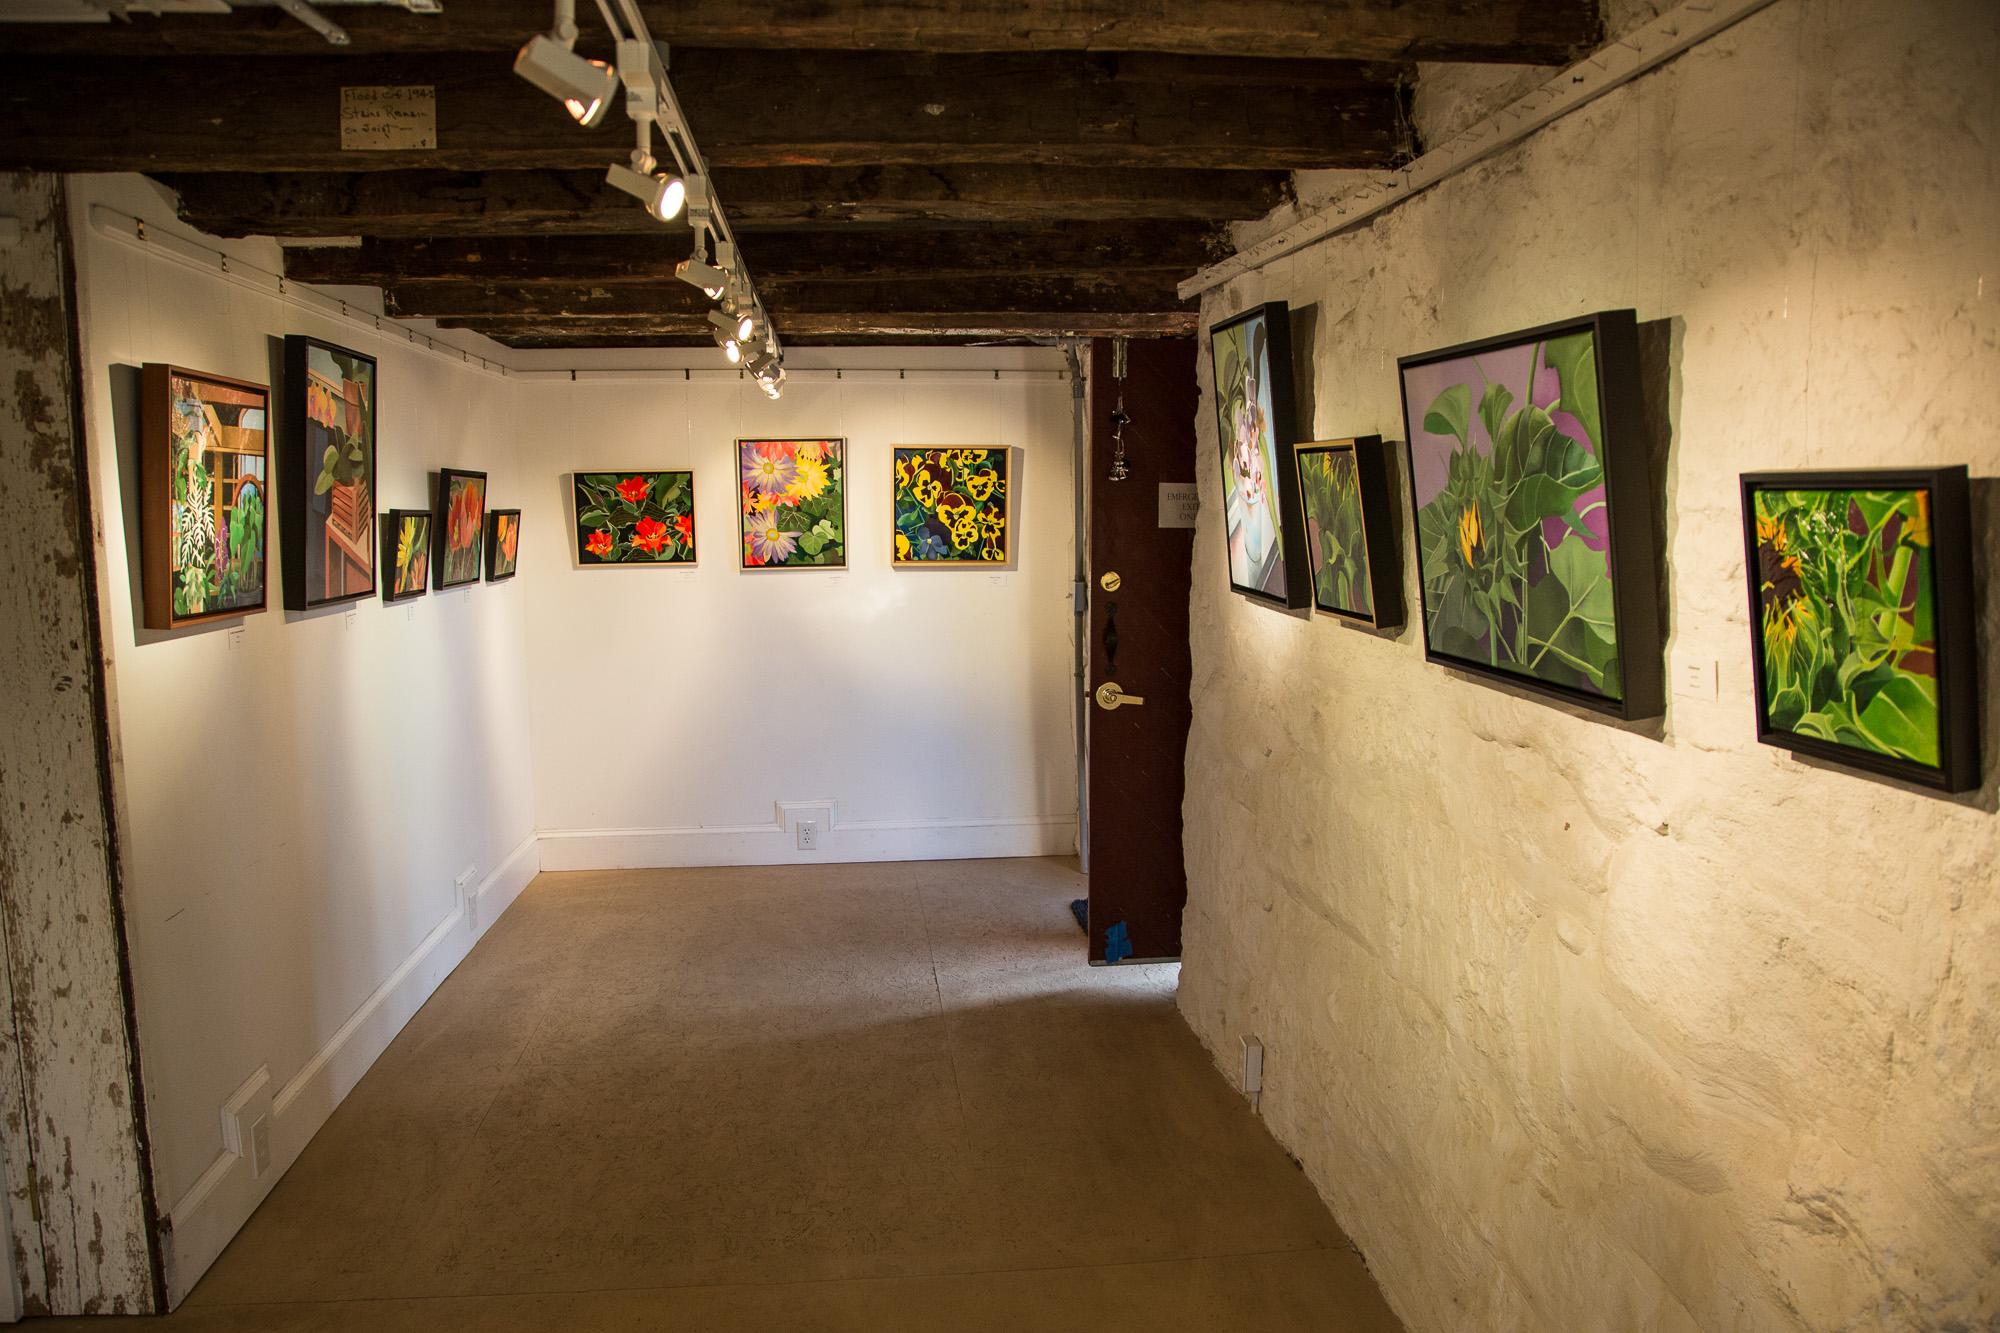 Kathy Guzman's Member's Gallery exhibit